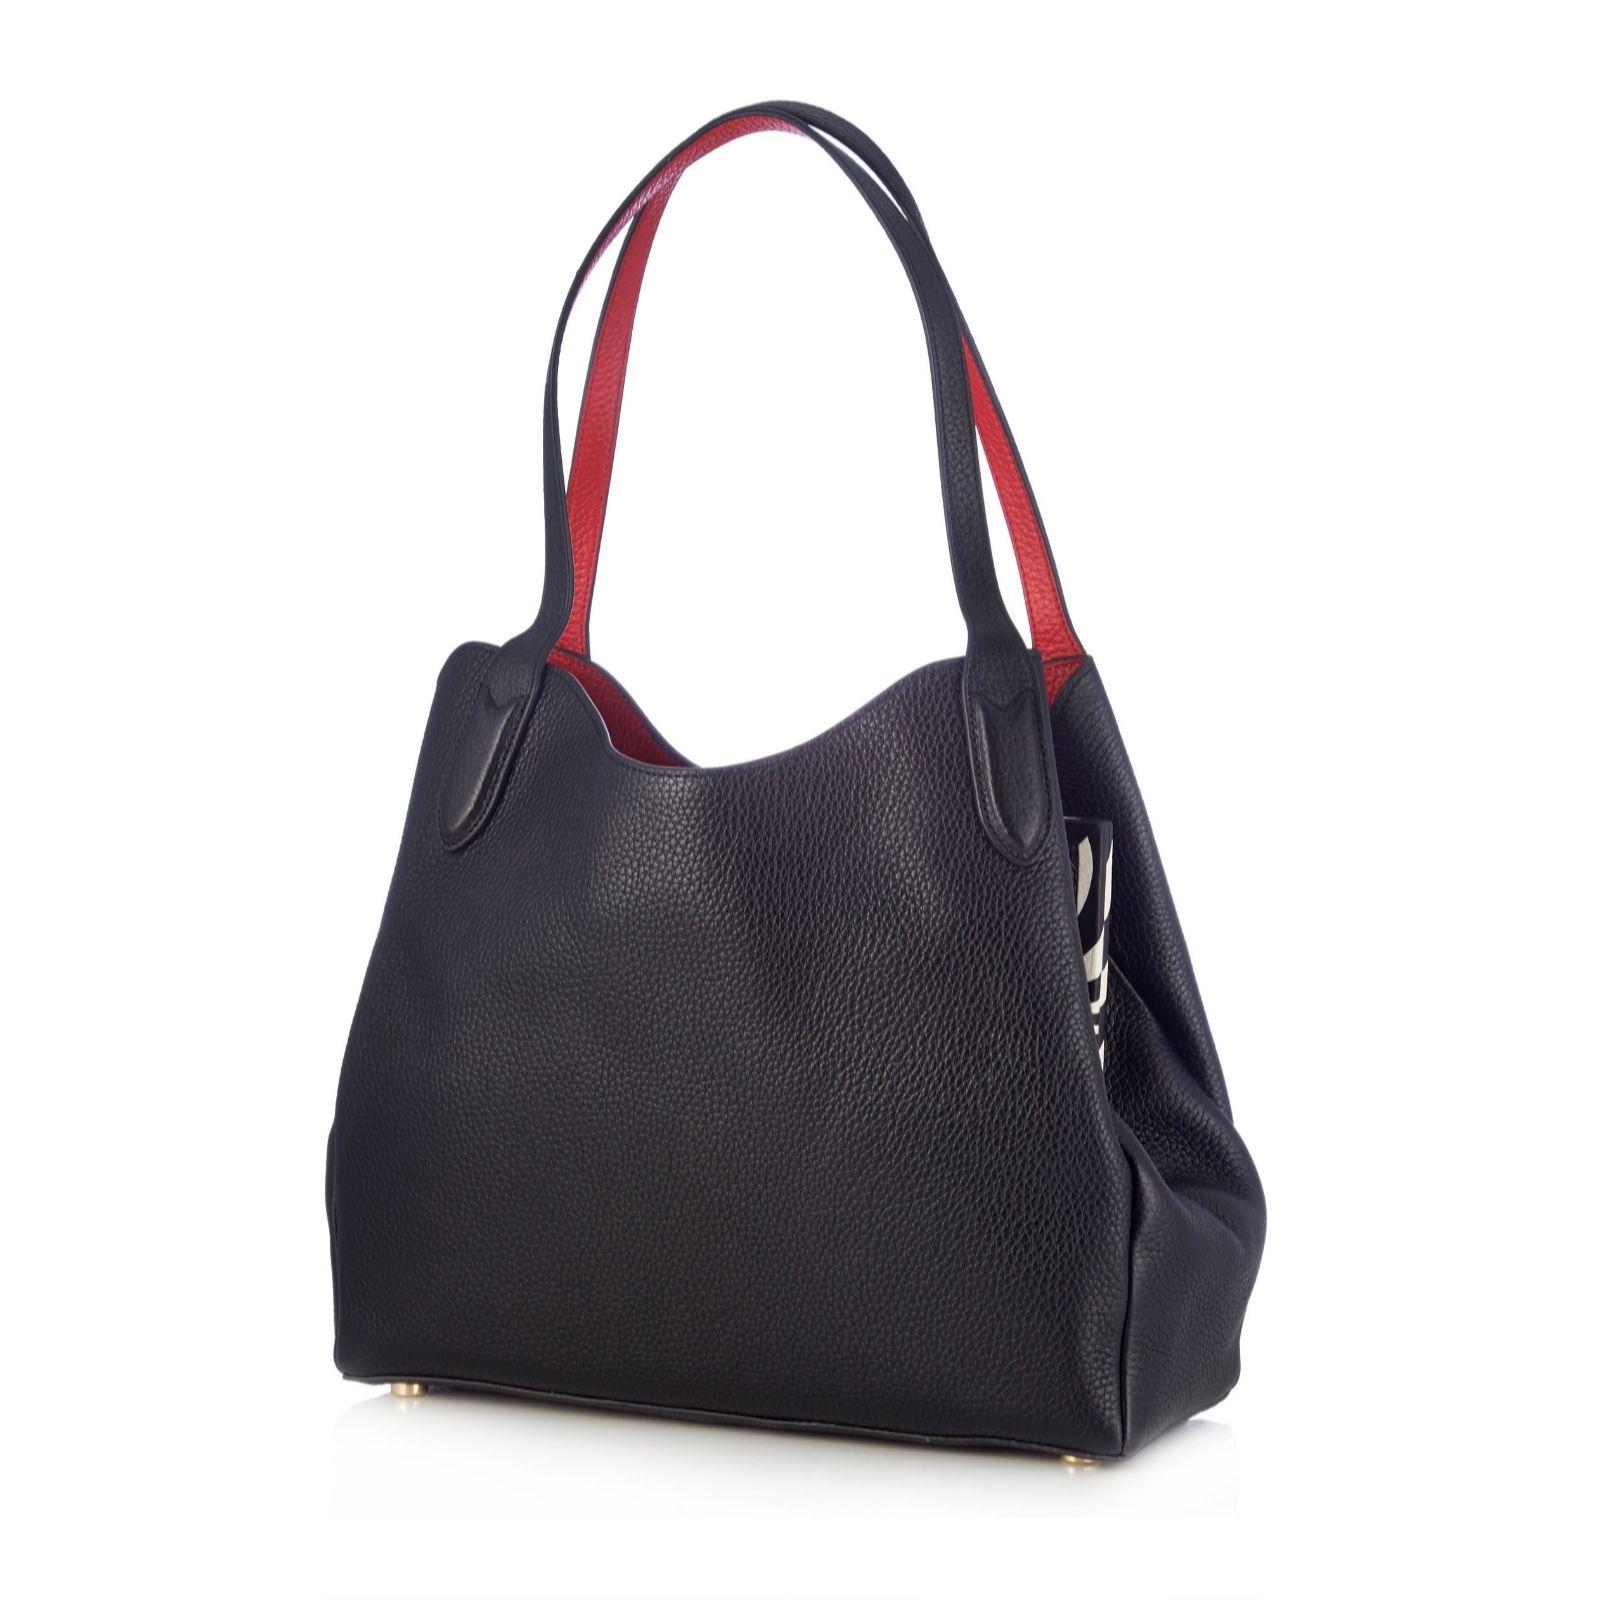 ad06ad5ee53d84 Lulu Guinness Jackie Leather Shoulder Bag - QVC UK